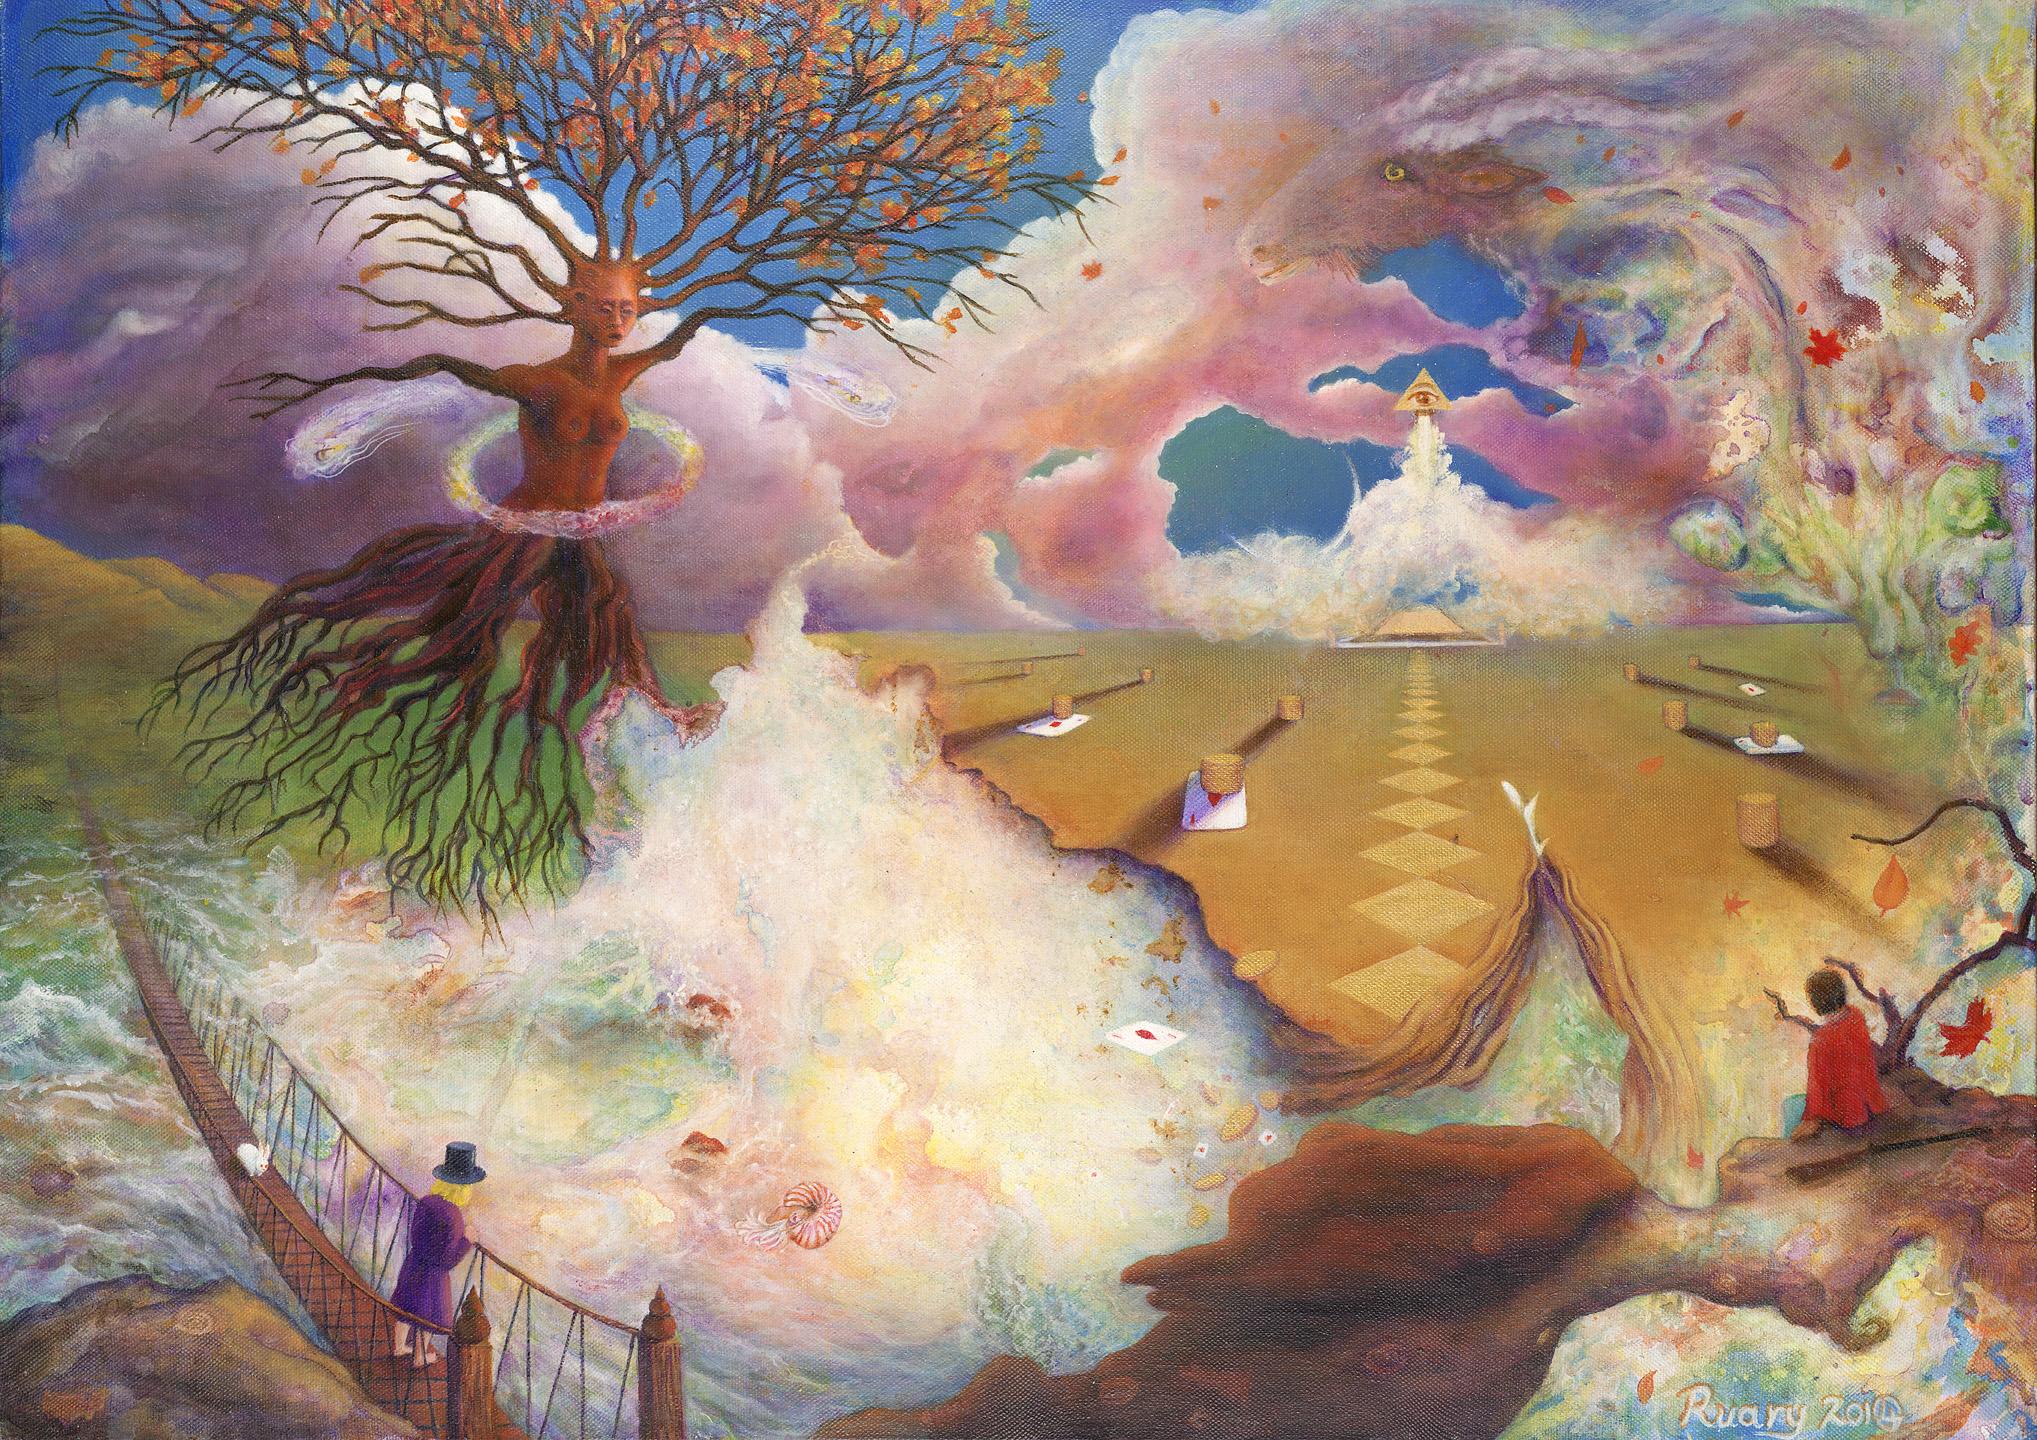 Evicting Mamon from the Nautilus (2010/14), Oil on canvas, 28 x 20″, Bangkok/Glastonbury, England